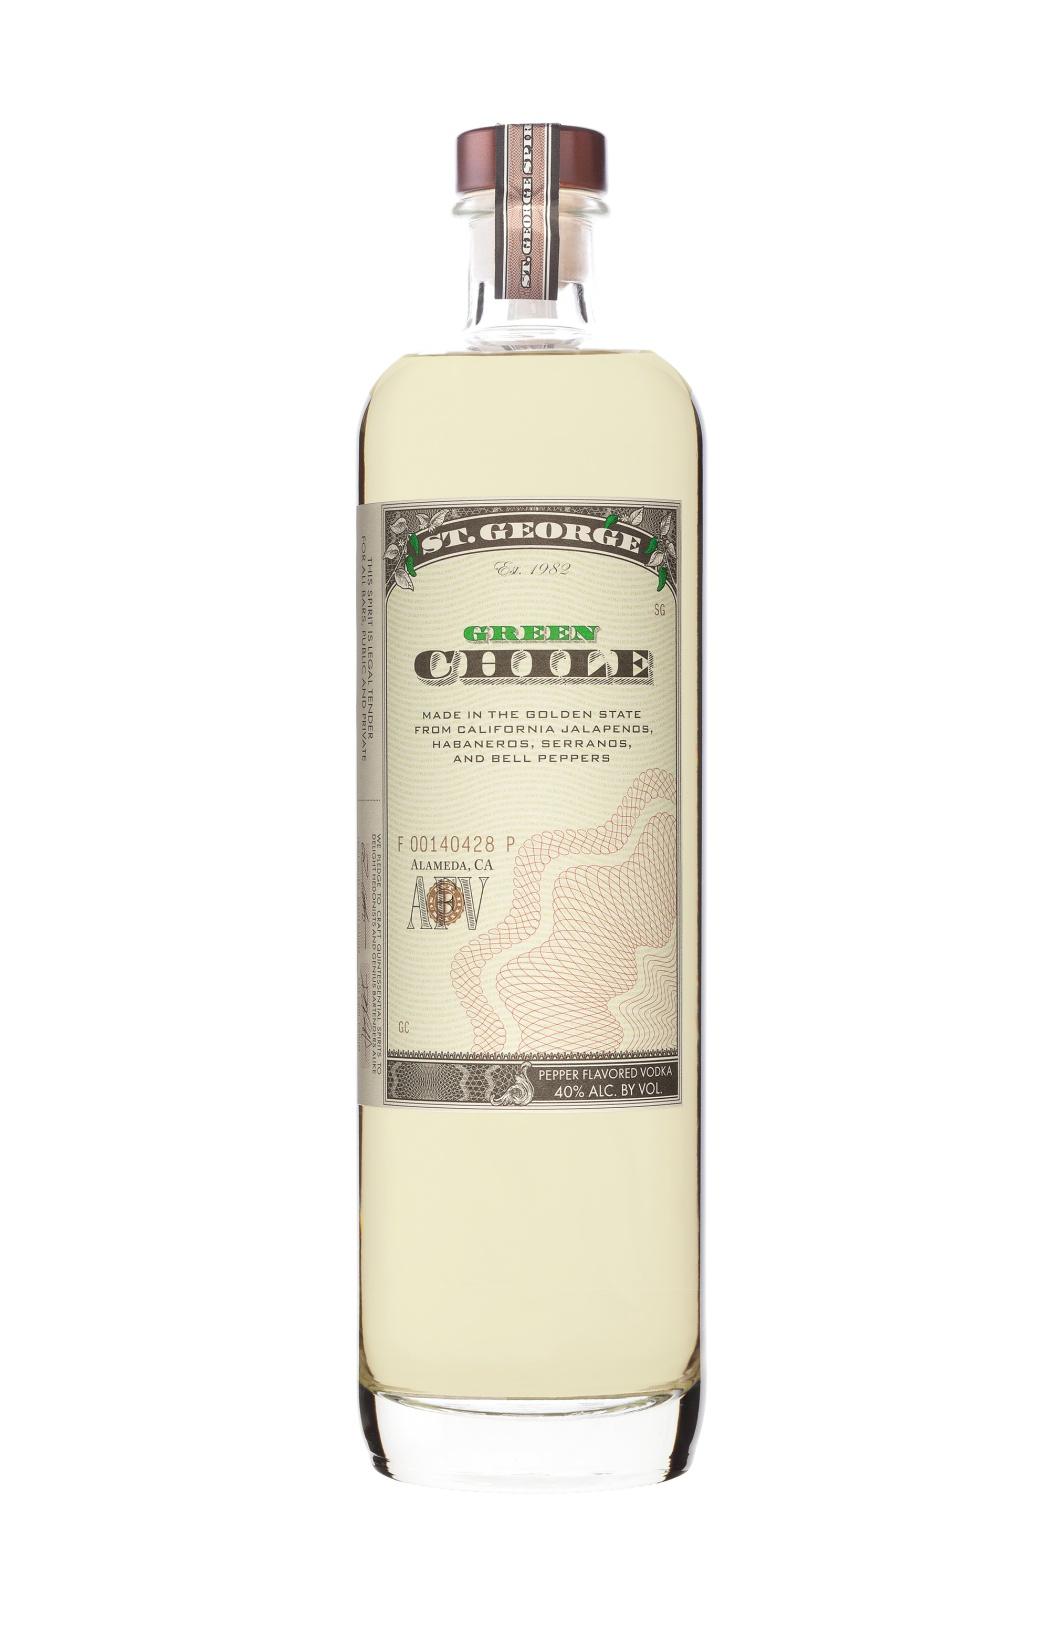 St George Green Chile Vodka - 4款辣酒,让你越喝越过瘾